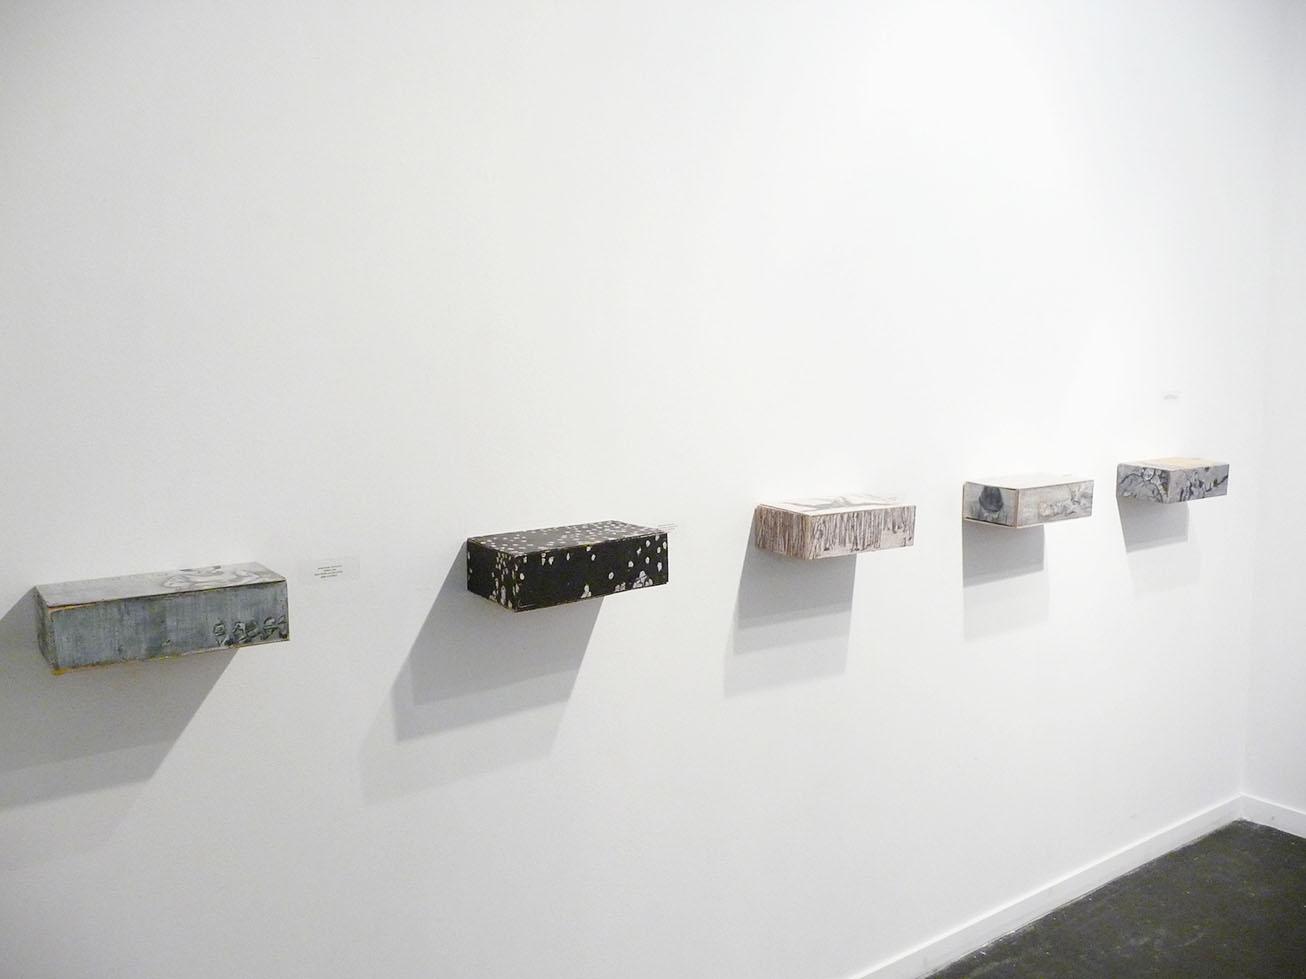 The Street, 2008